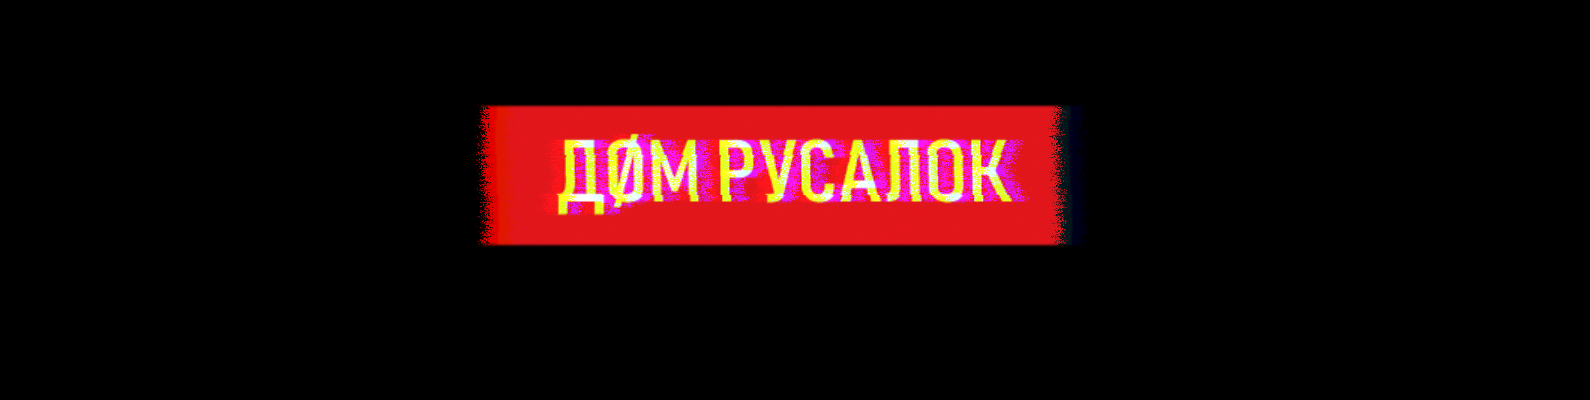 dom_rusalok | Дøм Русалок - игра про детство 90-х